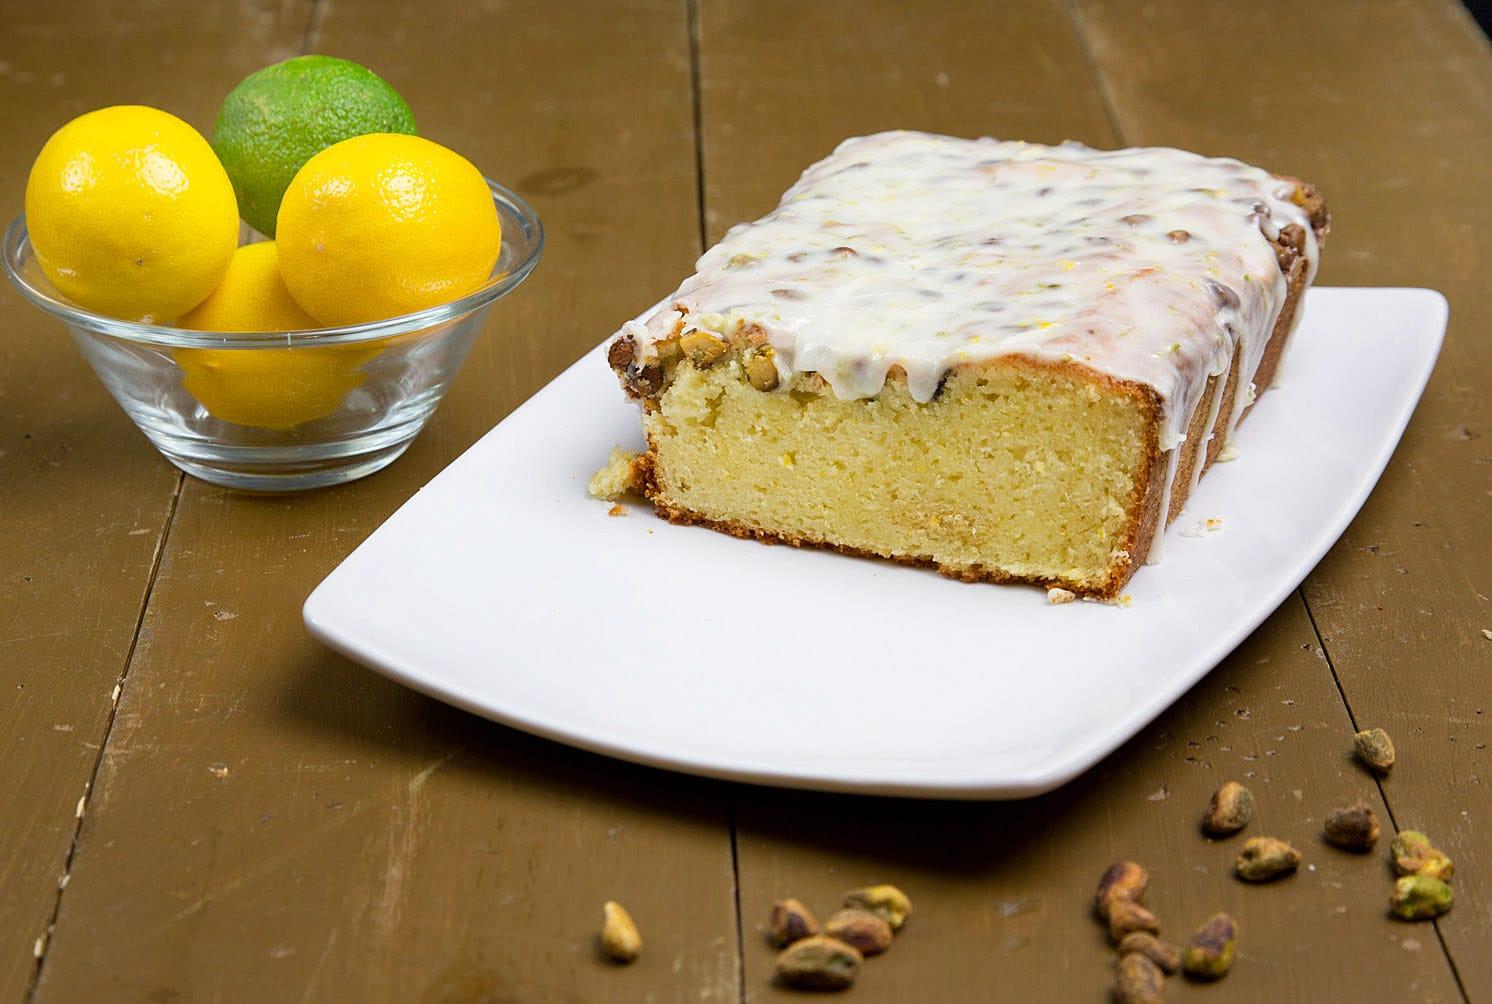 Meyer Lemon Pistachio Pound Cake with a lemon lime glaze